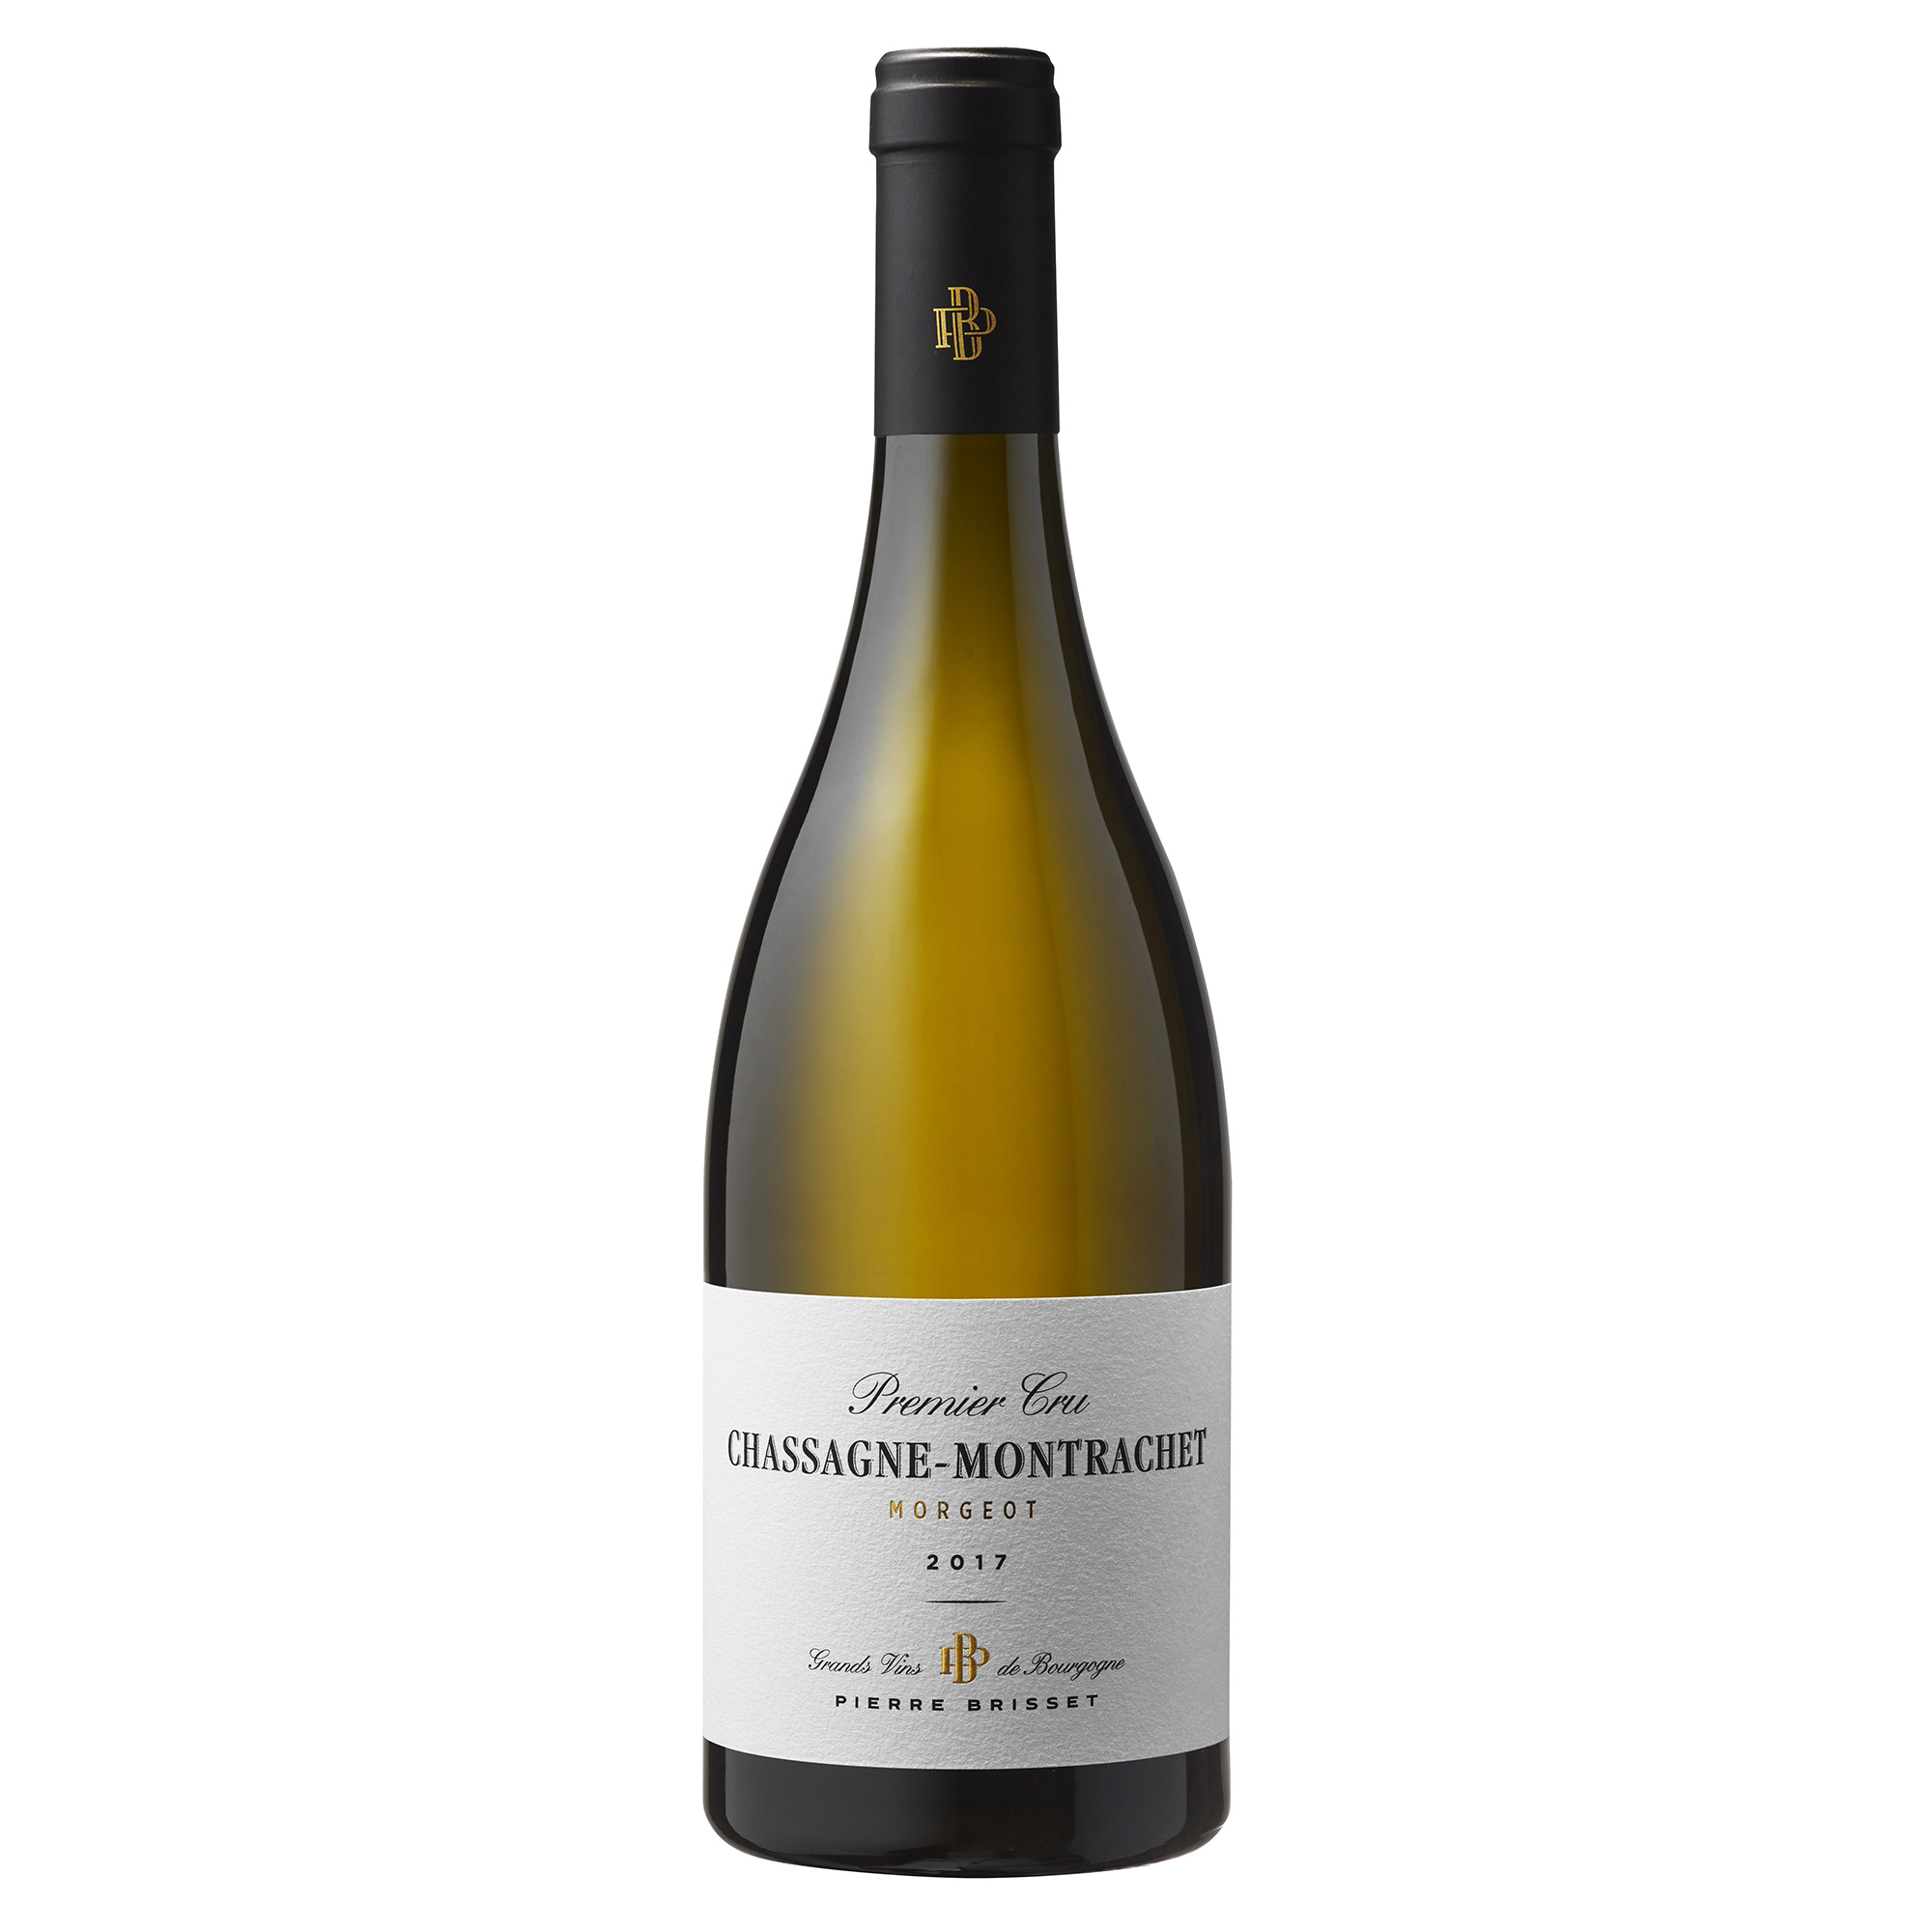 Chassagne Montrachet Morgeot 2017